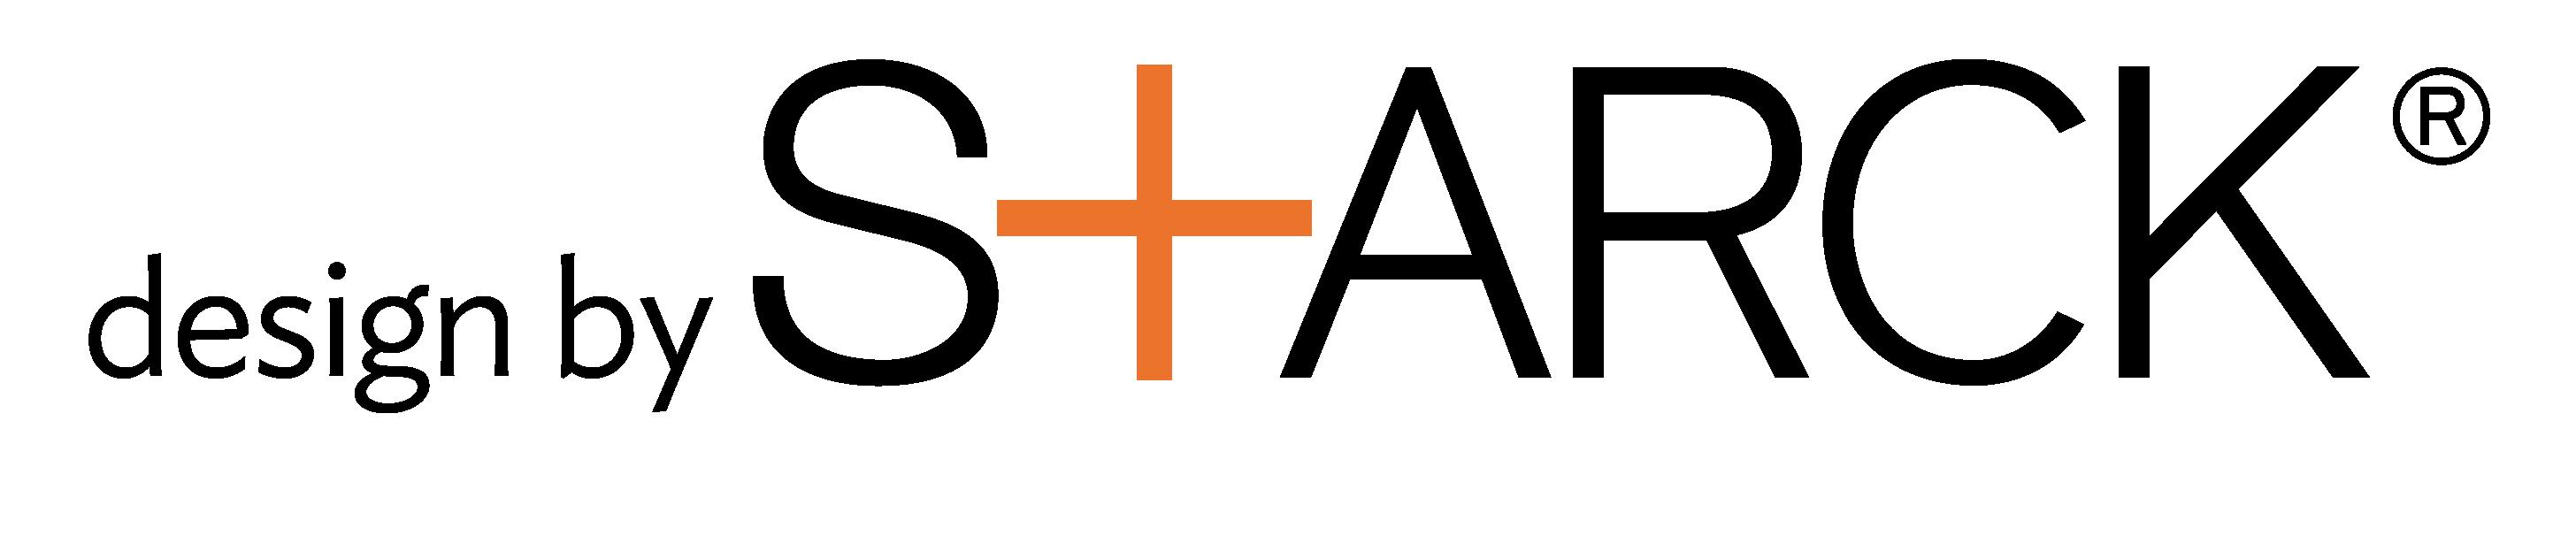 Philippe starck logo